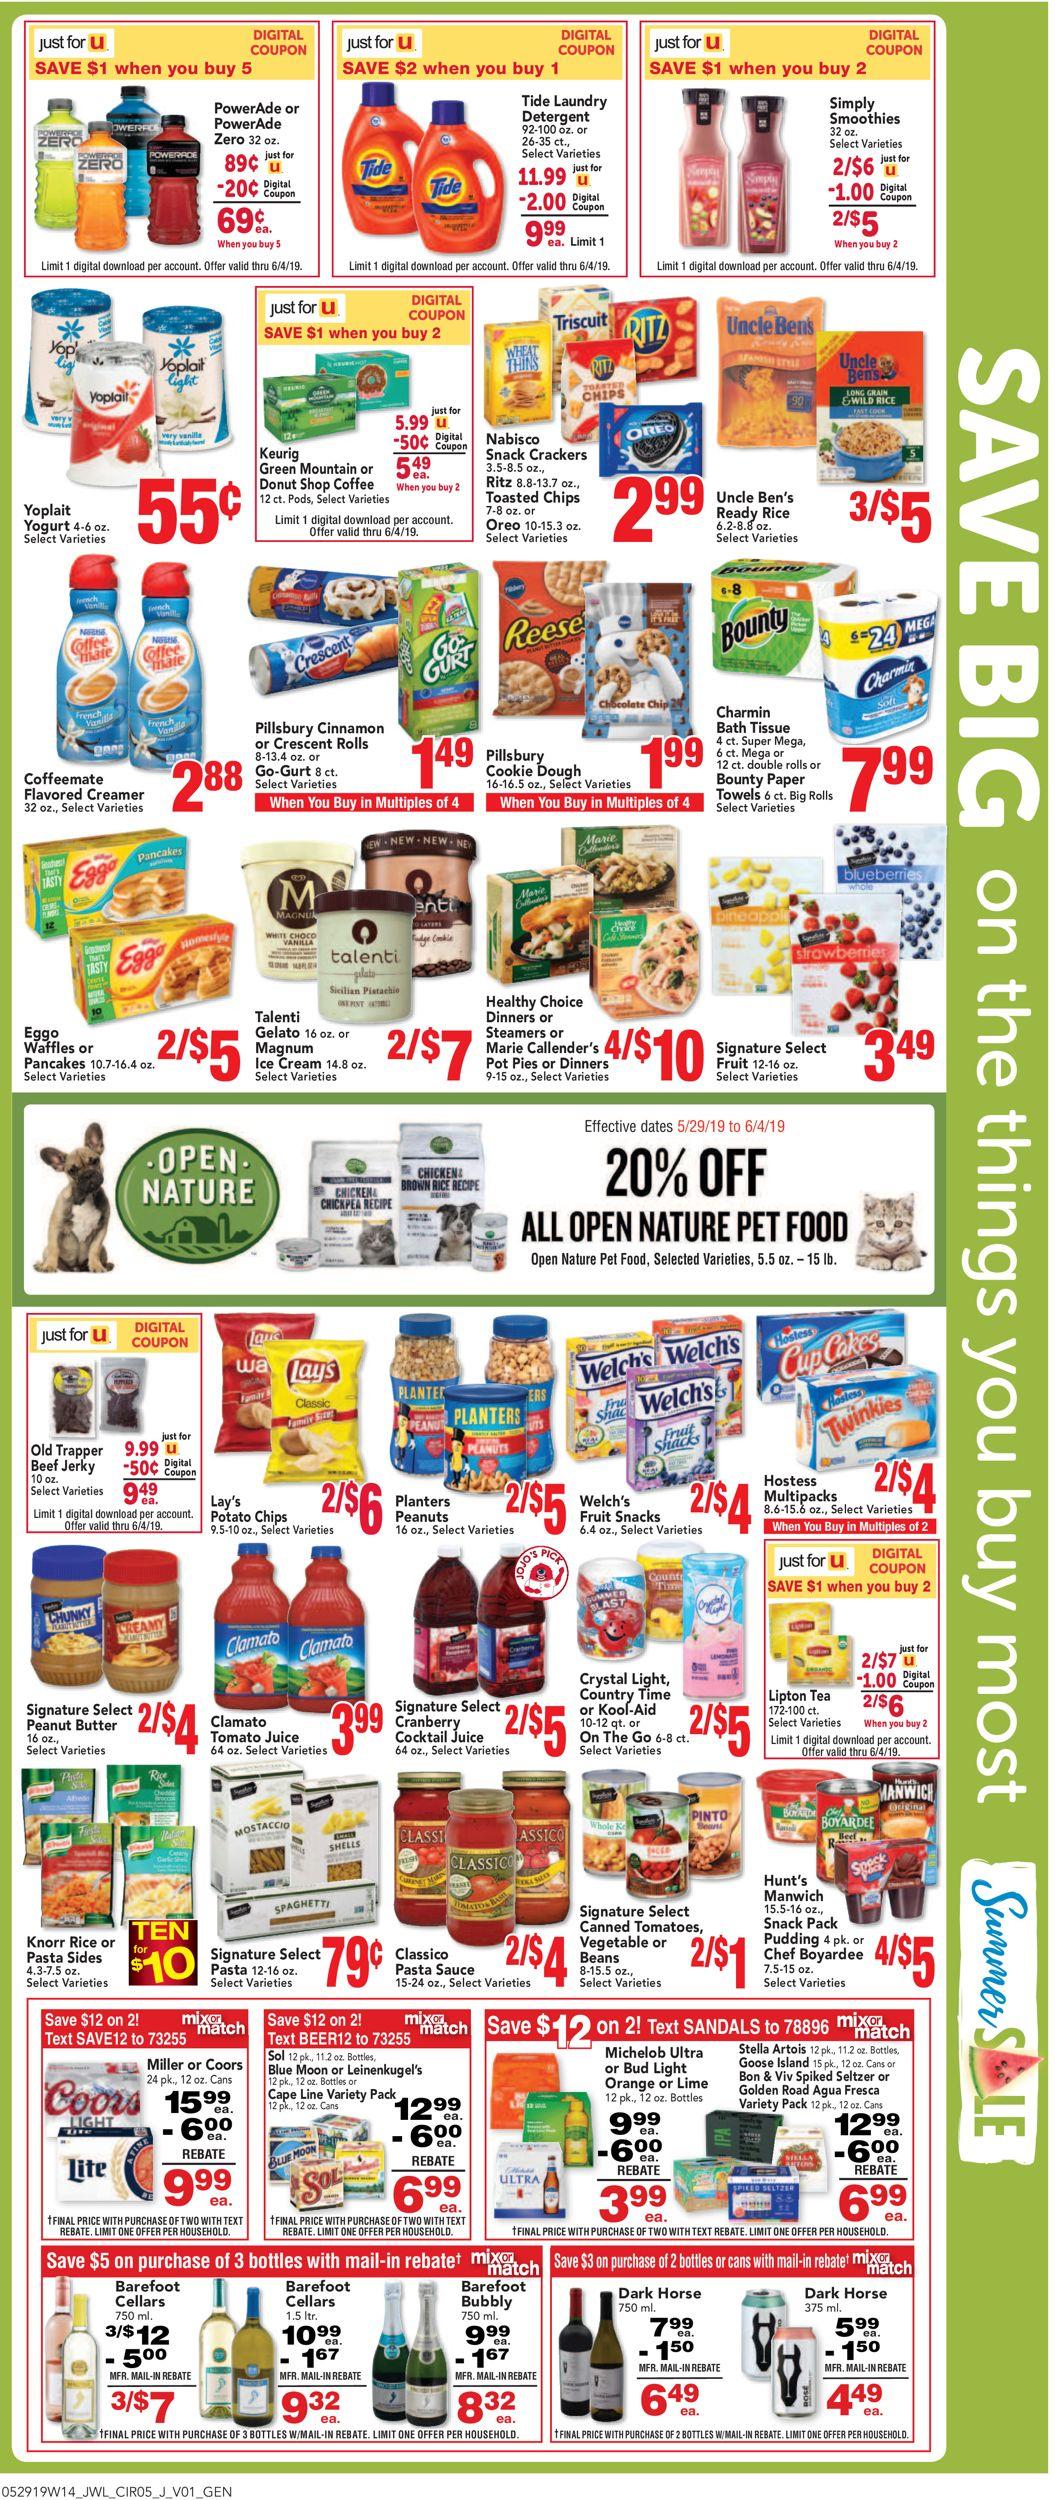 Jewel Osco Current weekly ad 05/29 - 06/04/2019 [6